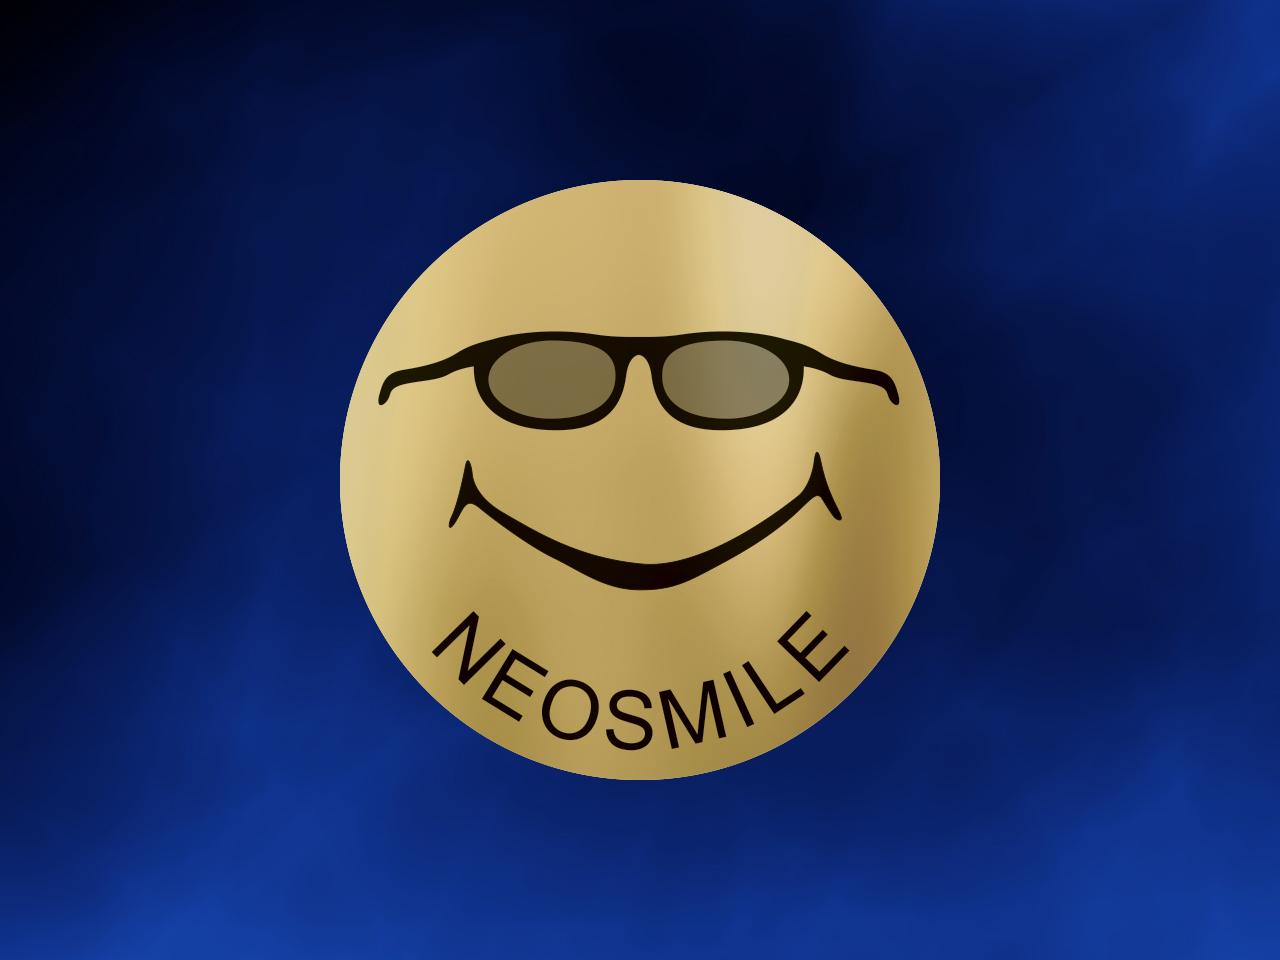 N731_NeoSmile_1280x960